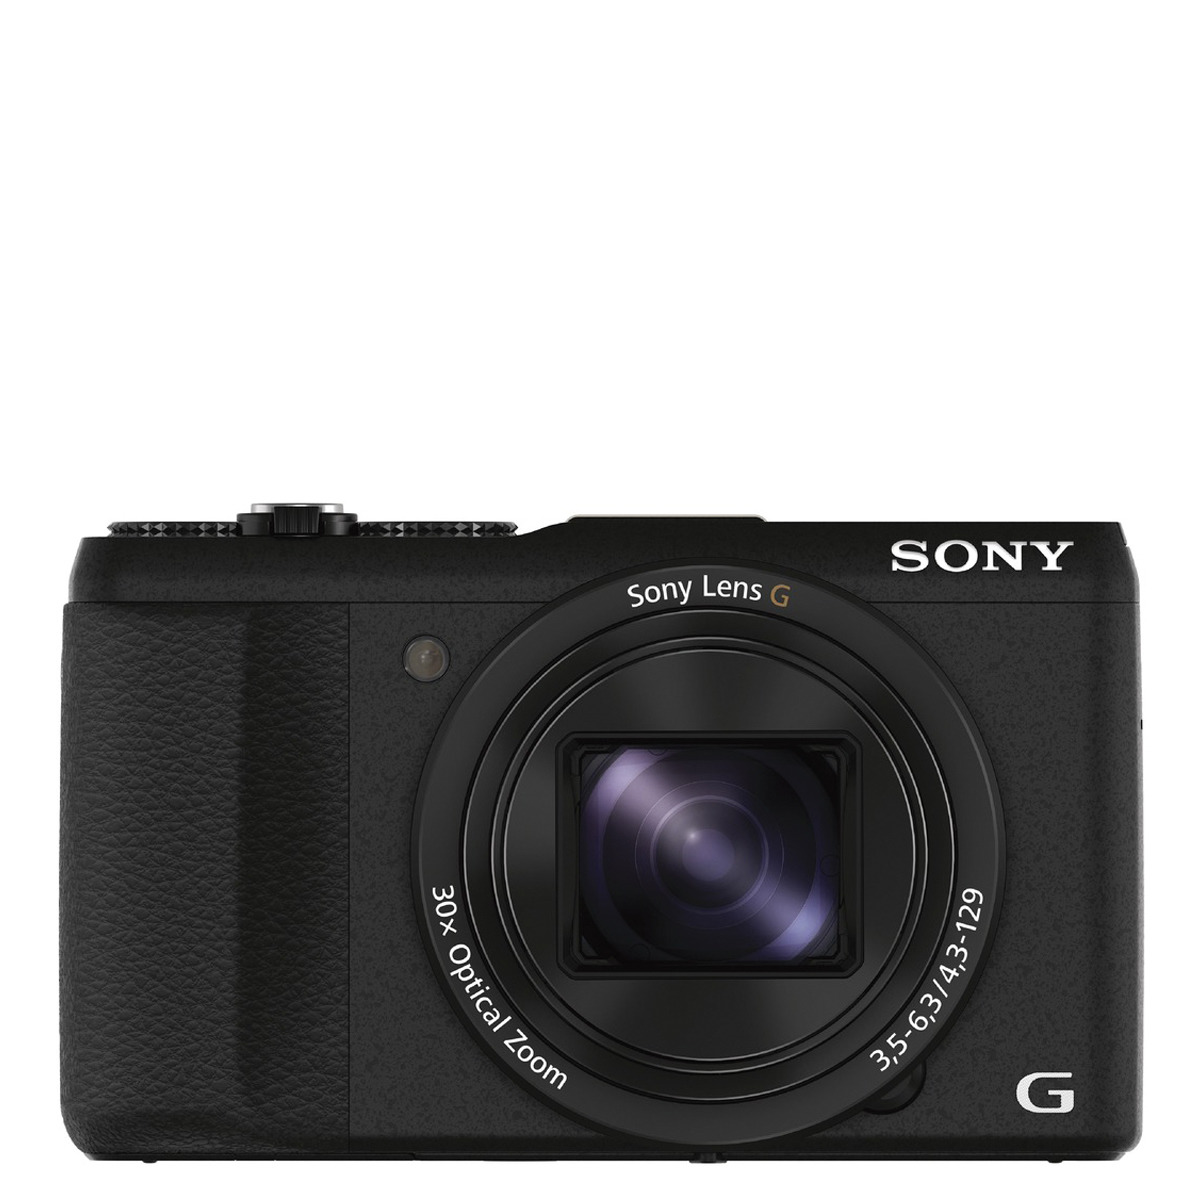 Cámara digital Sony DSC-HX60V de 20,4 MP